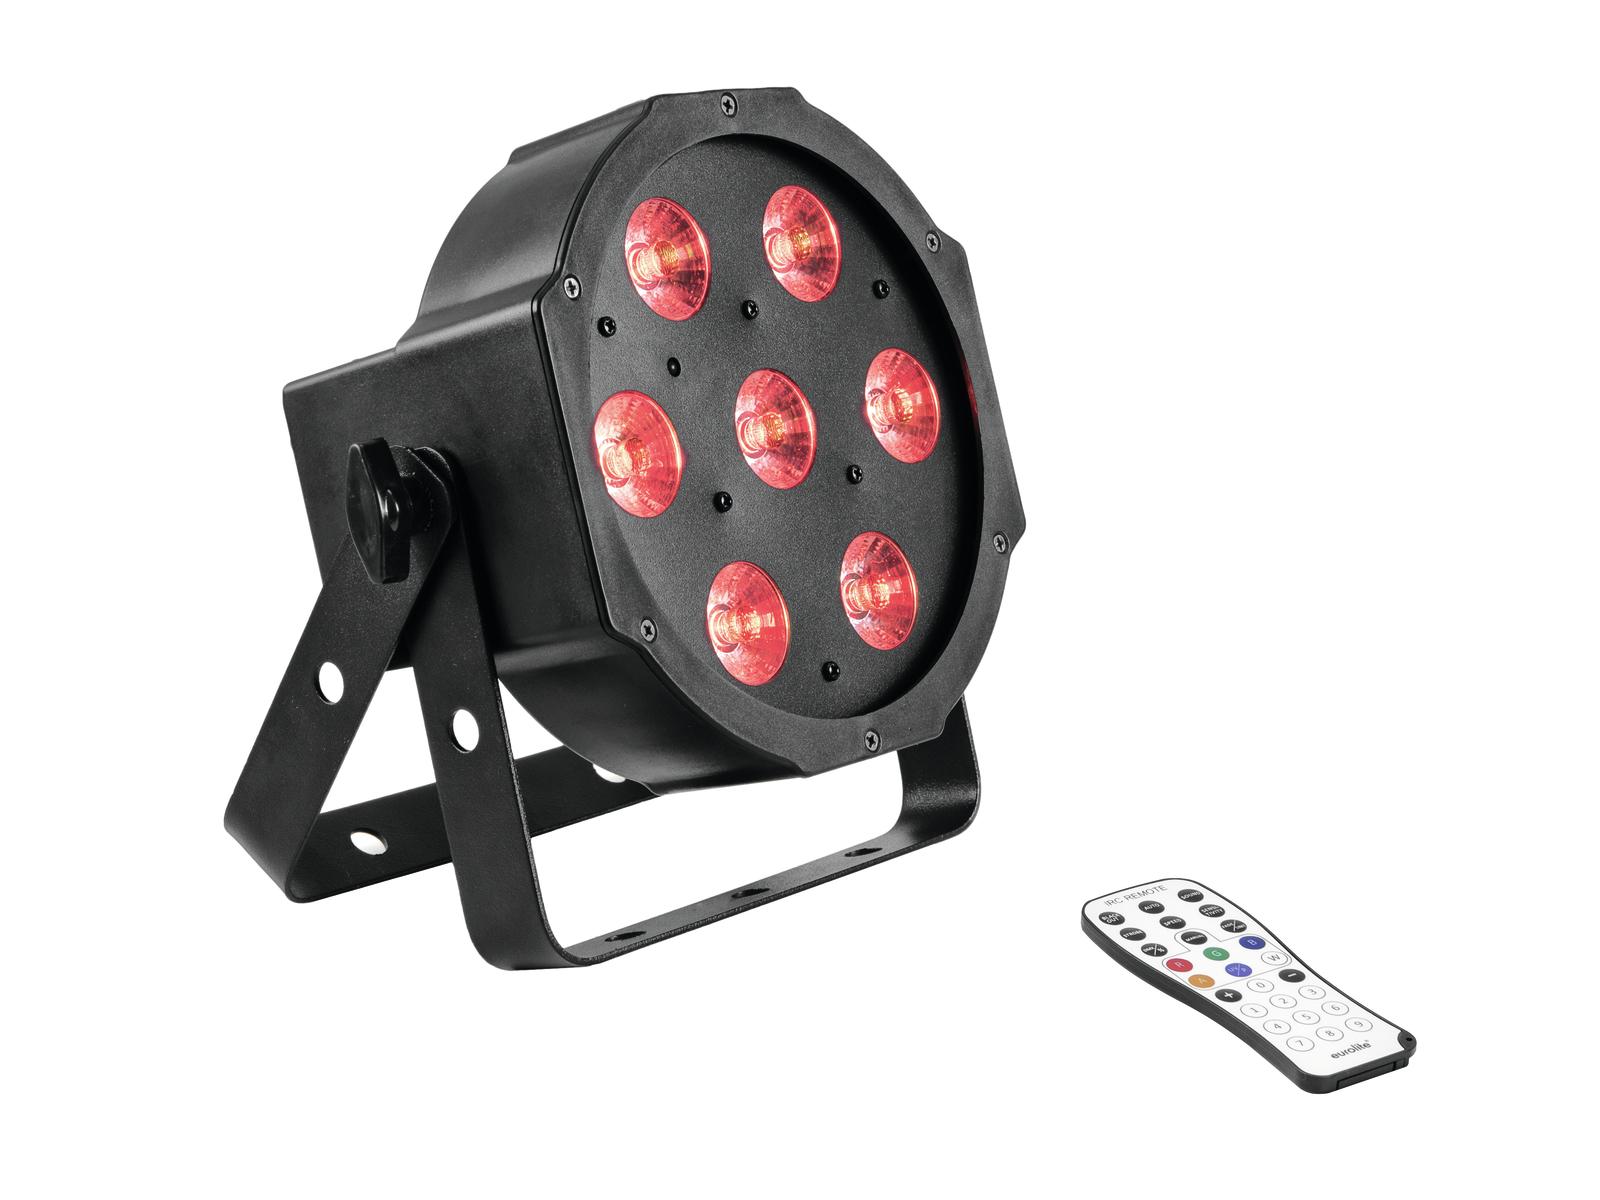 Eurolite LED SLS-7 DMX, 7x 10W TCL LED, IR, reflektor